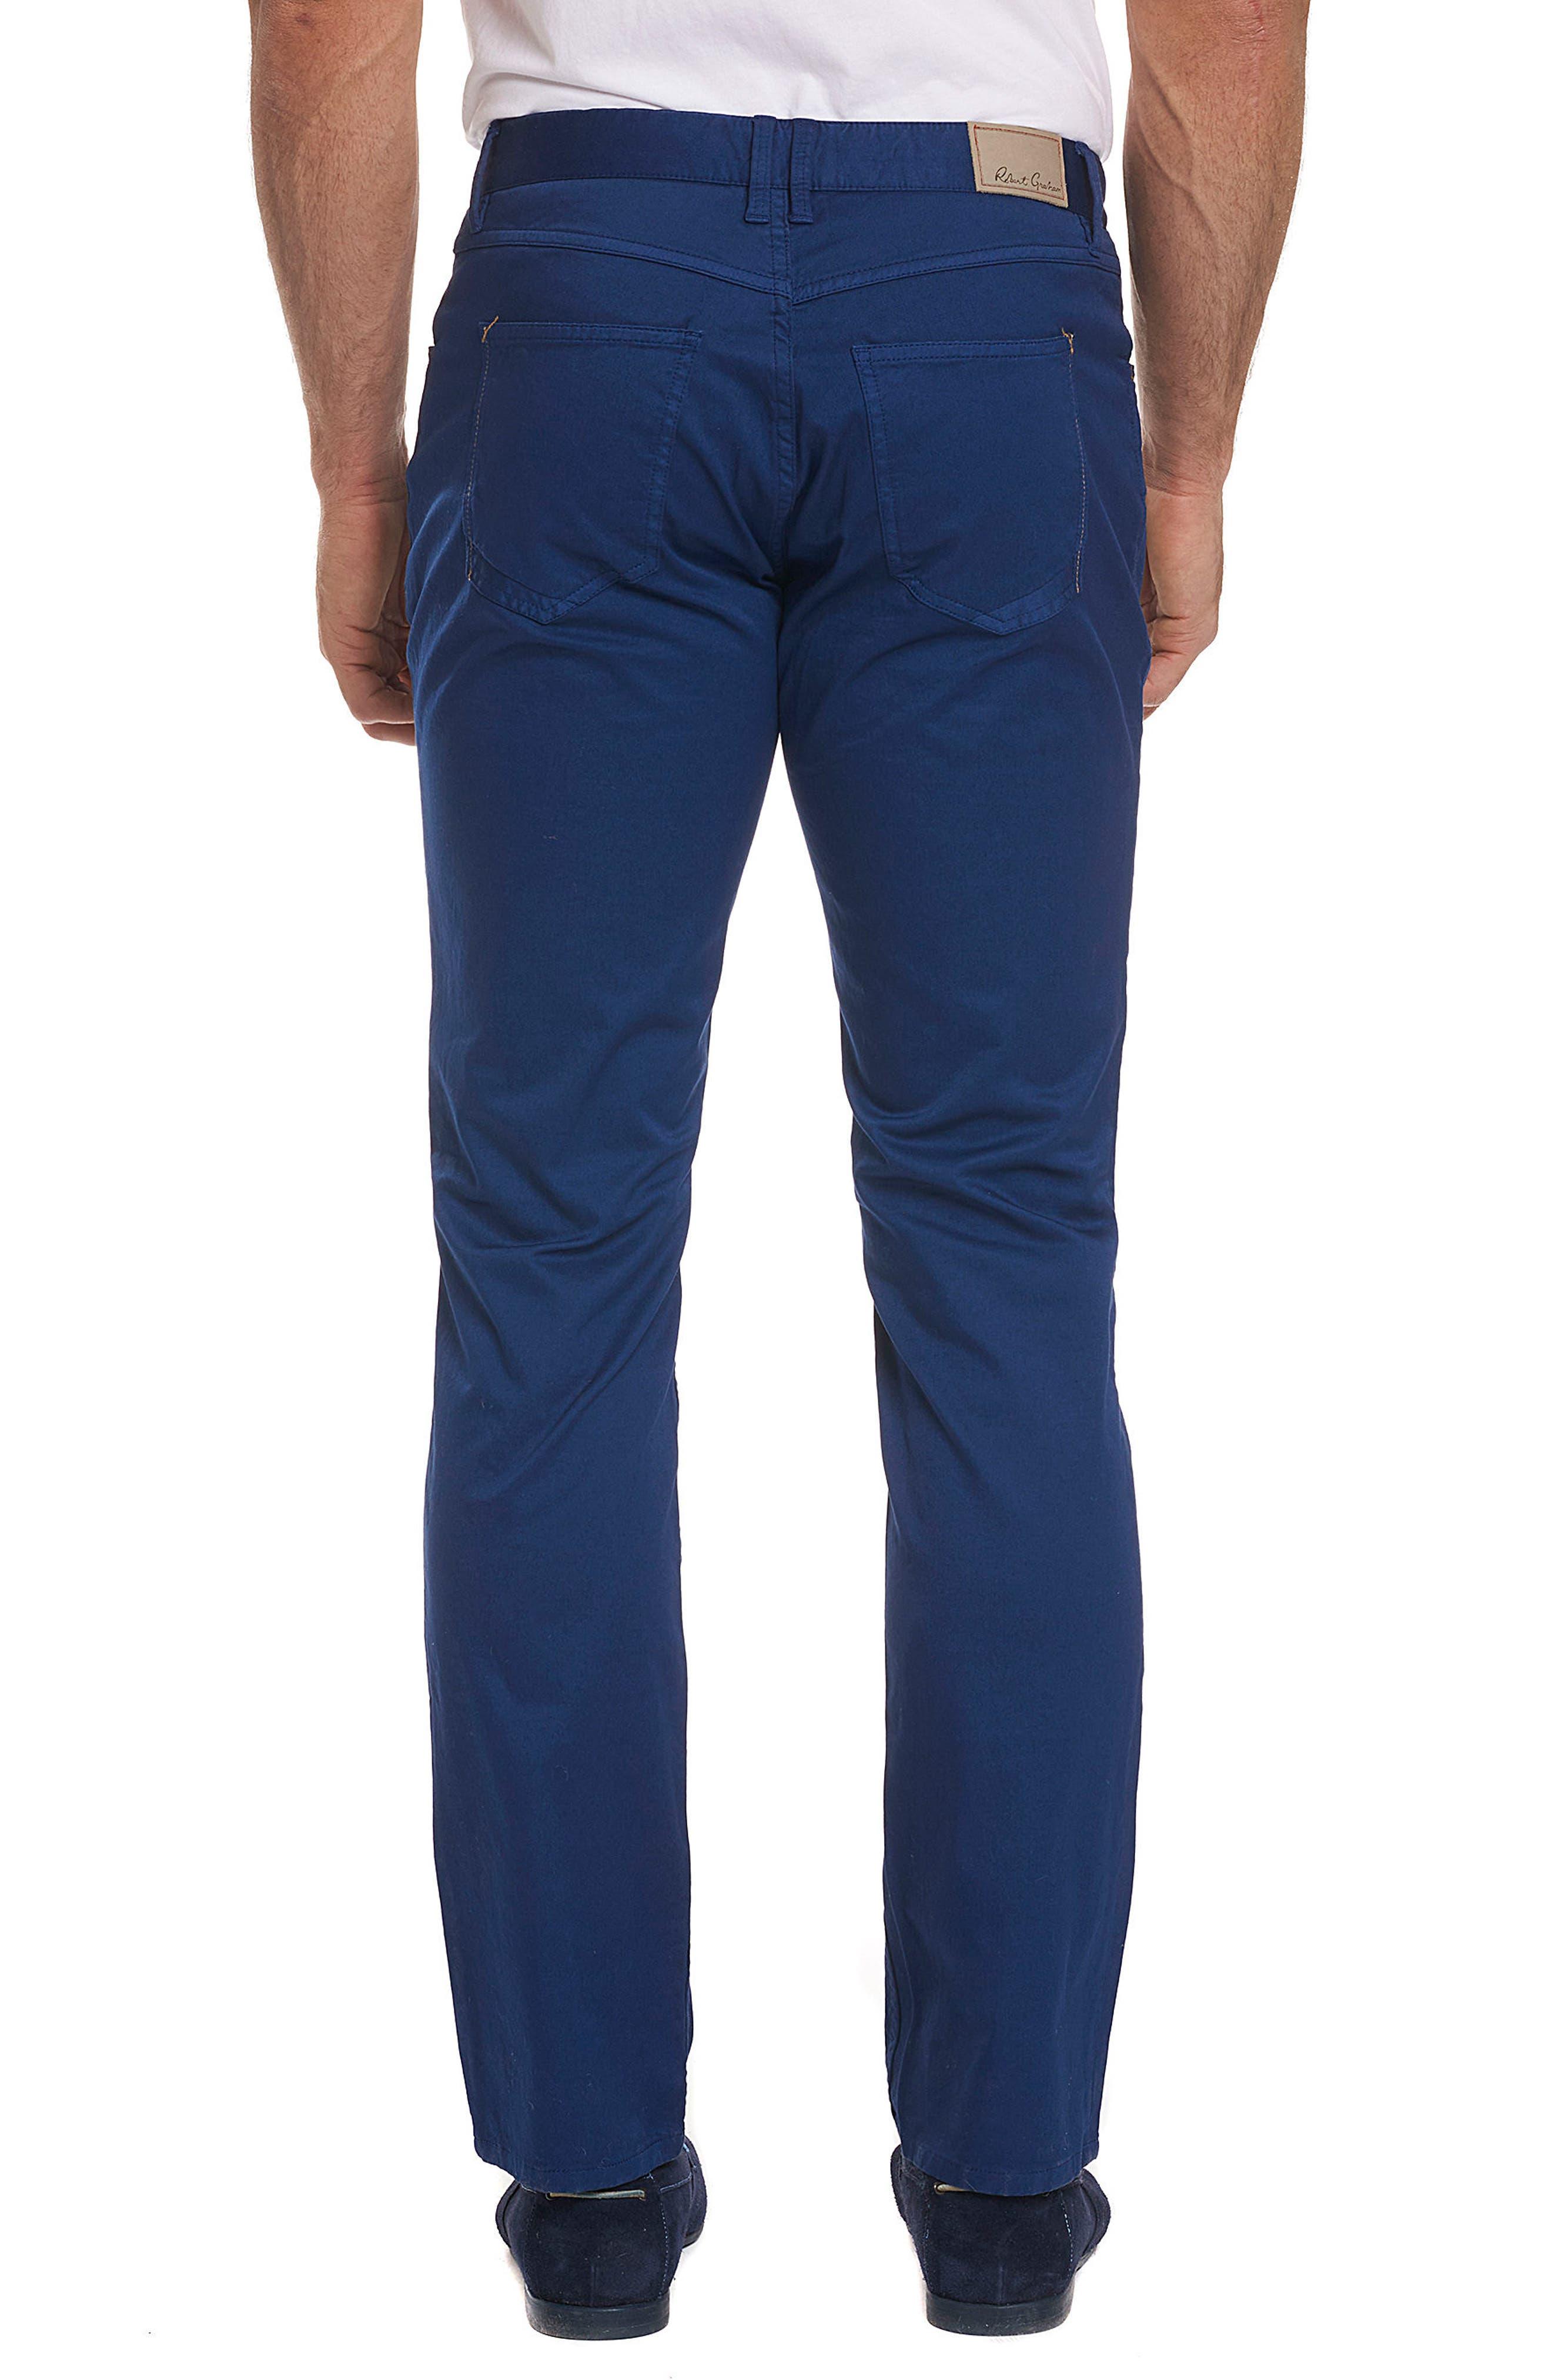 Marti Tailored Fit Pants,                             Alternate thumbnail 2, color,                             BLUE